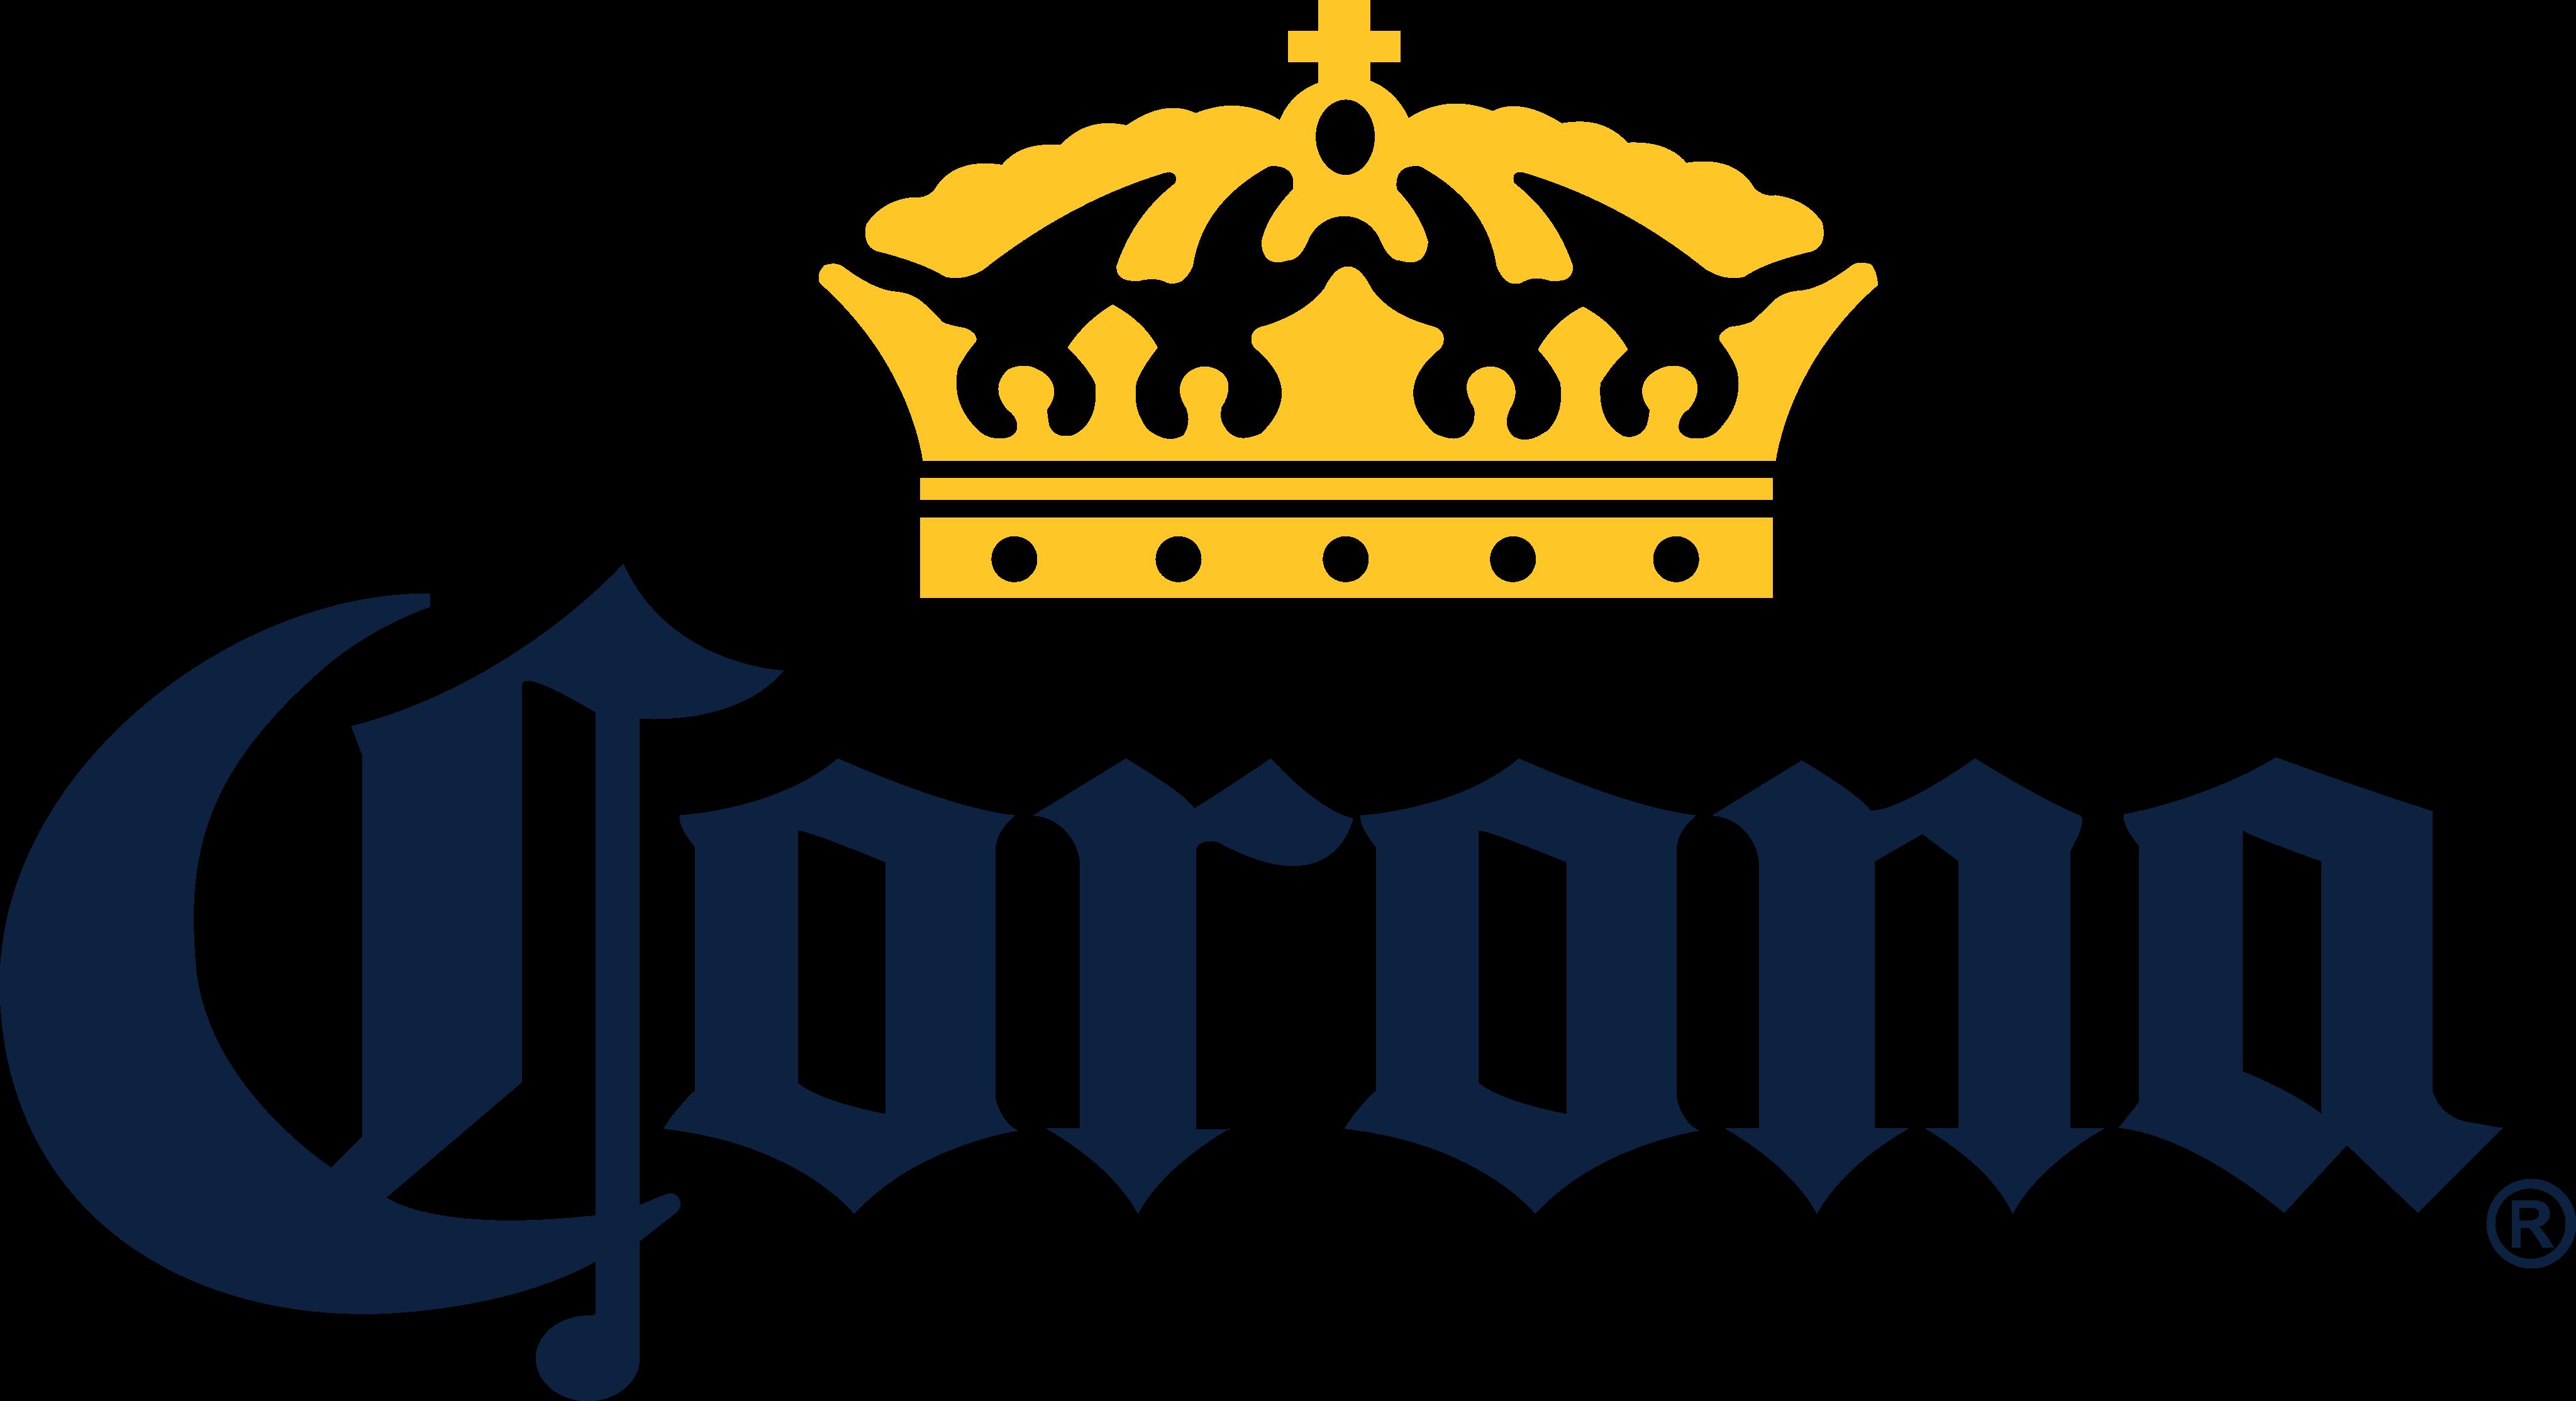 corona logo - Corona Logo